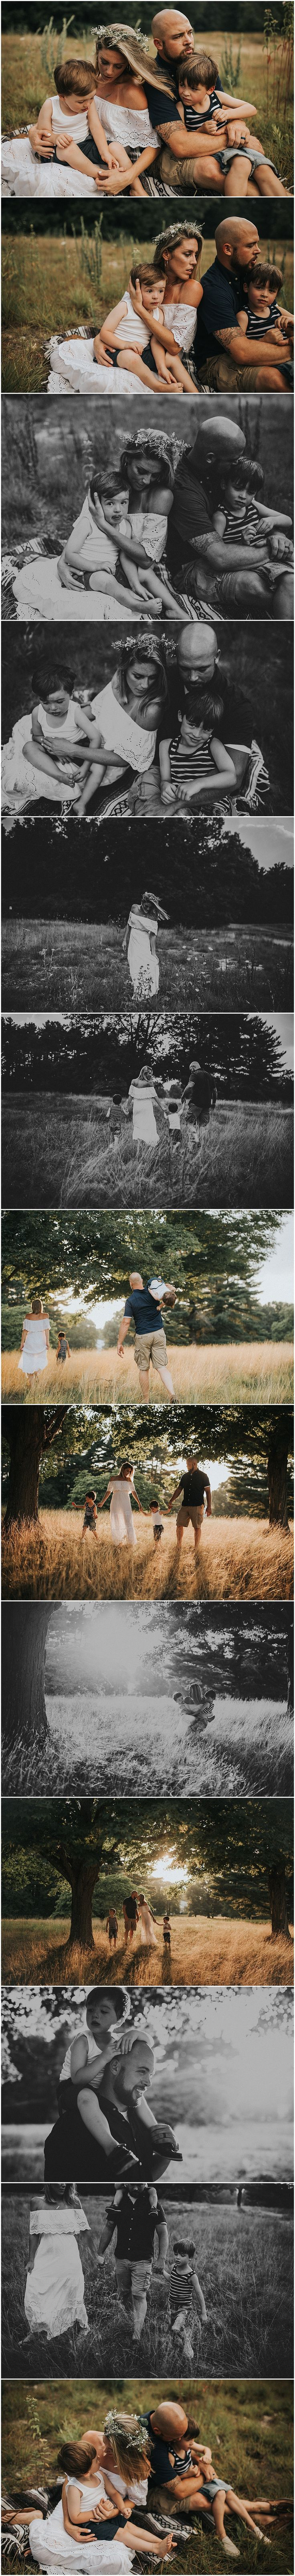 Massachusetts Family Photographer: Sarah Driscoll Photography-- bohemian outdoor family photoshoot